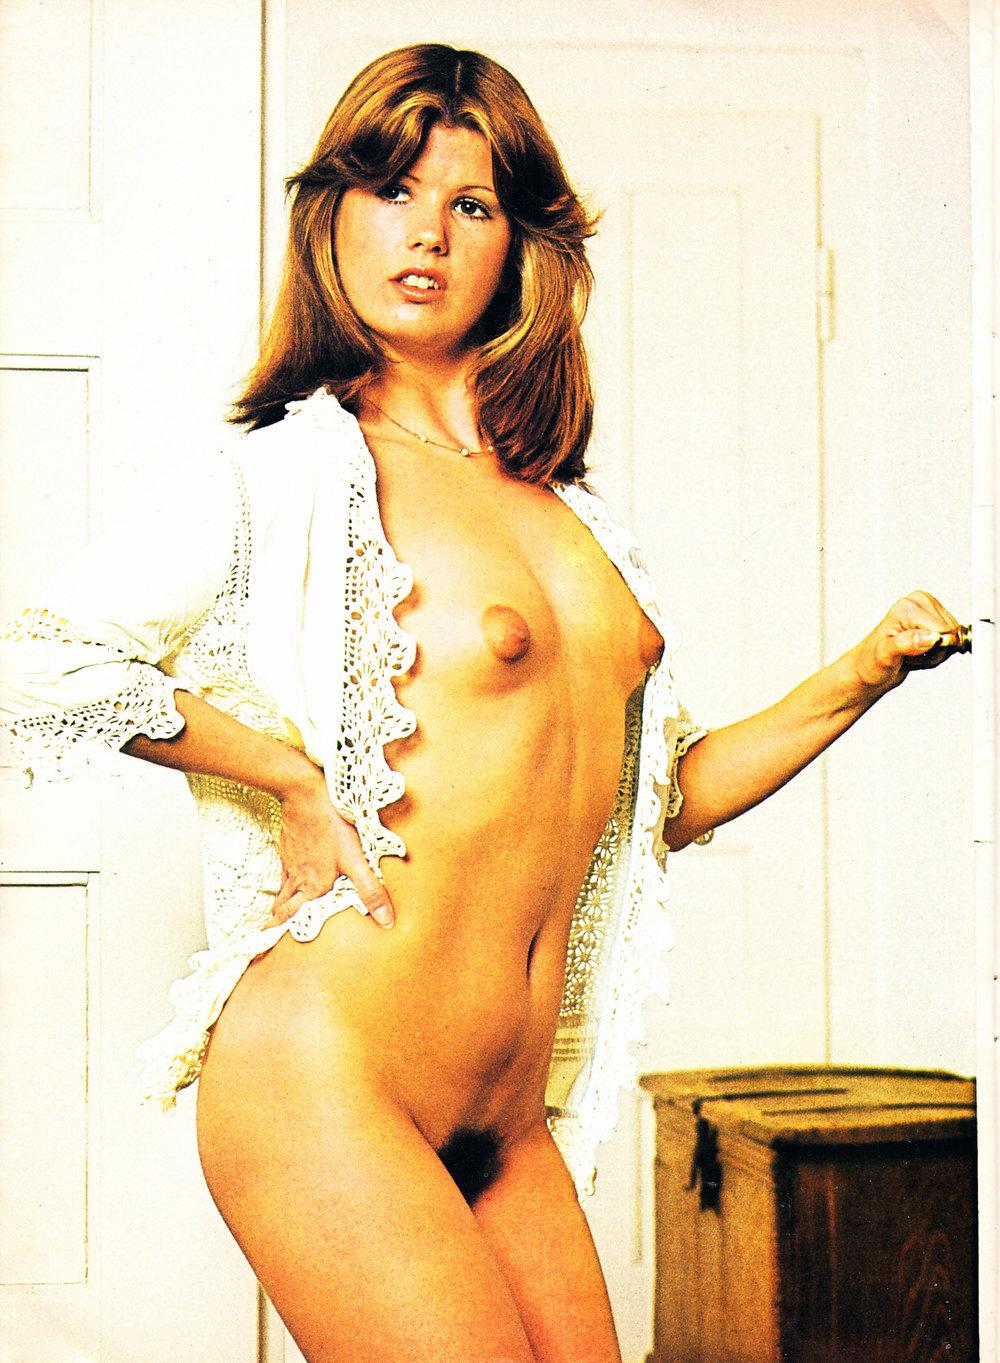 deborah-ralls-moi-magazine-1969